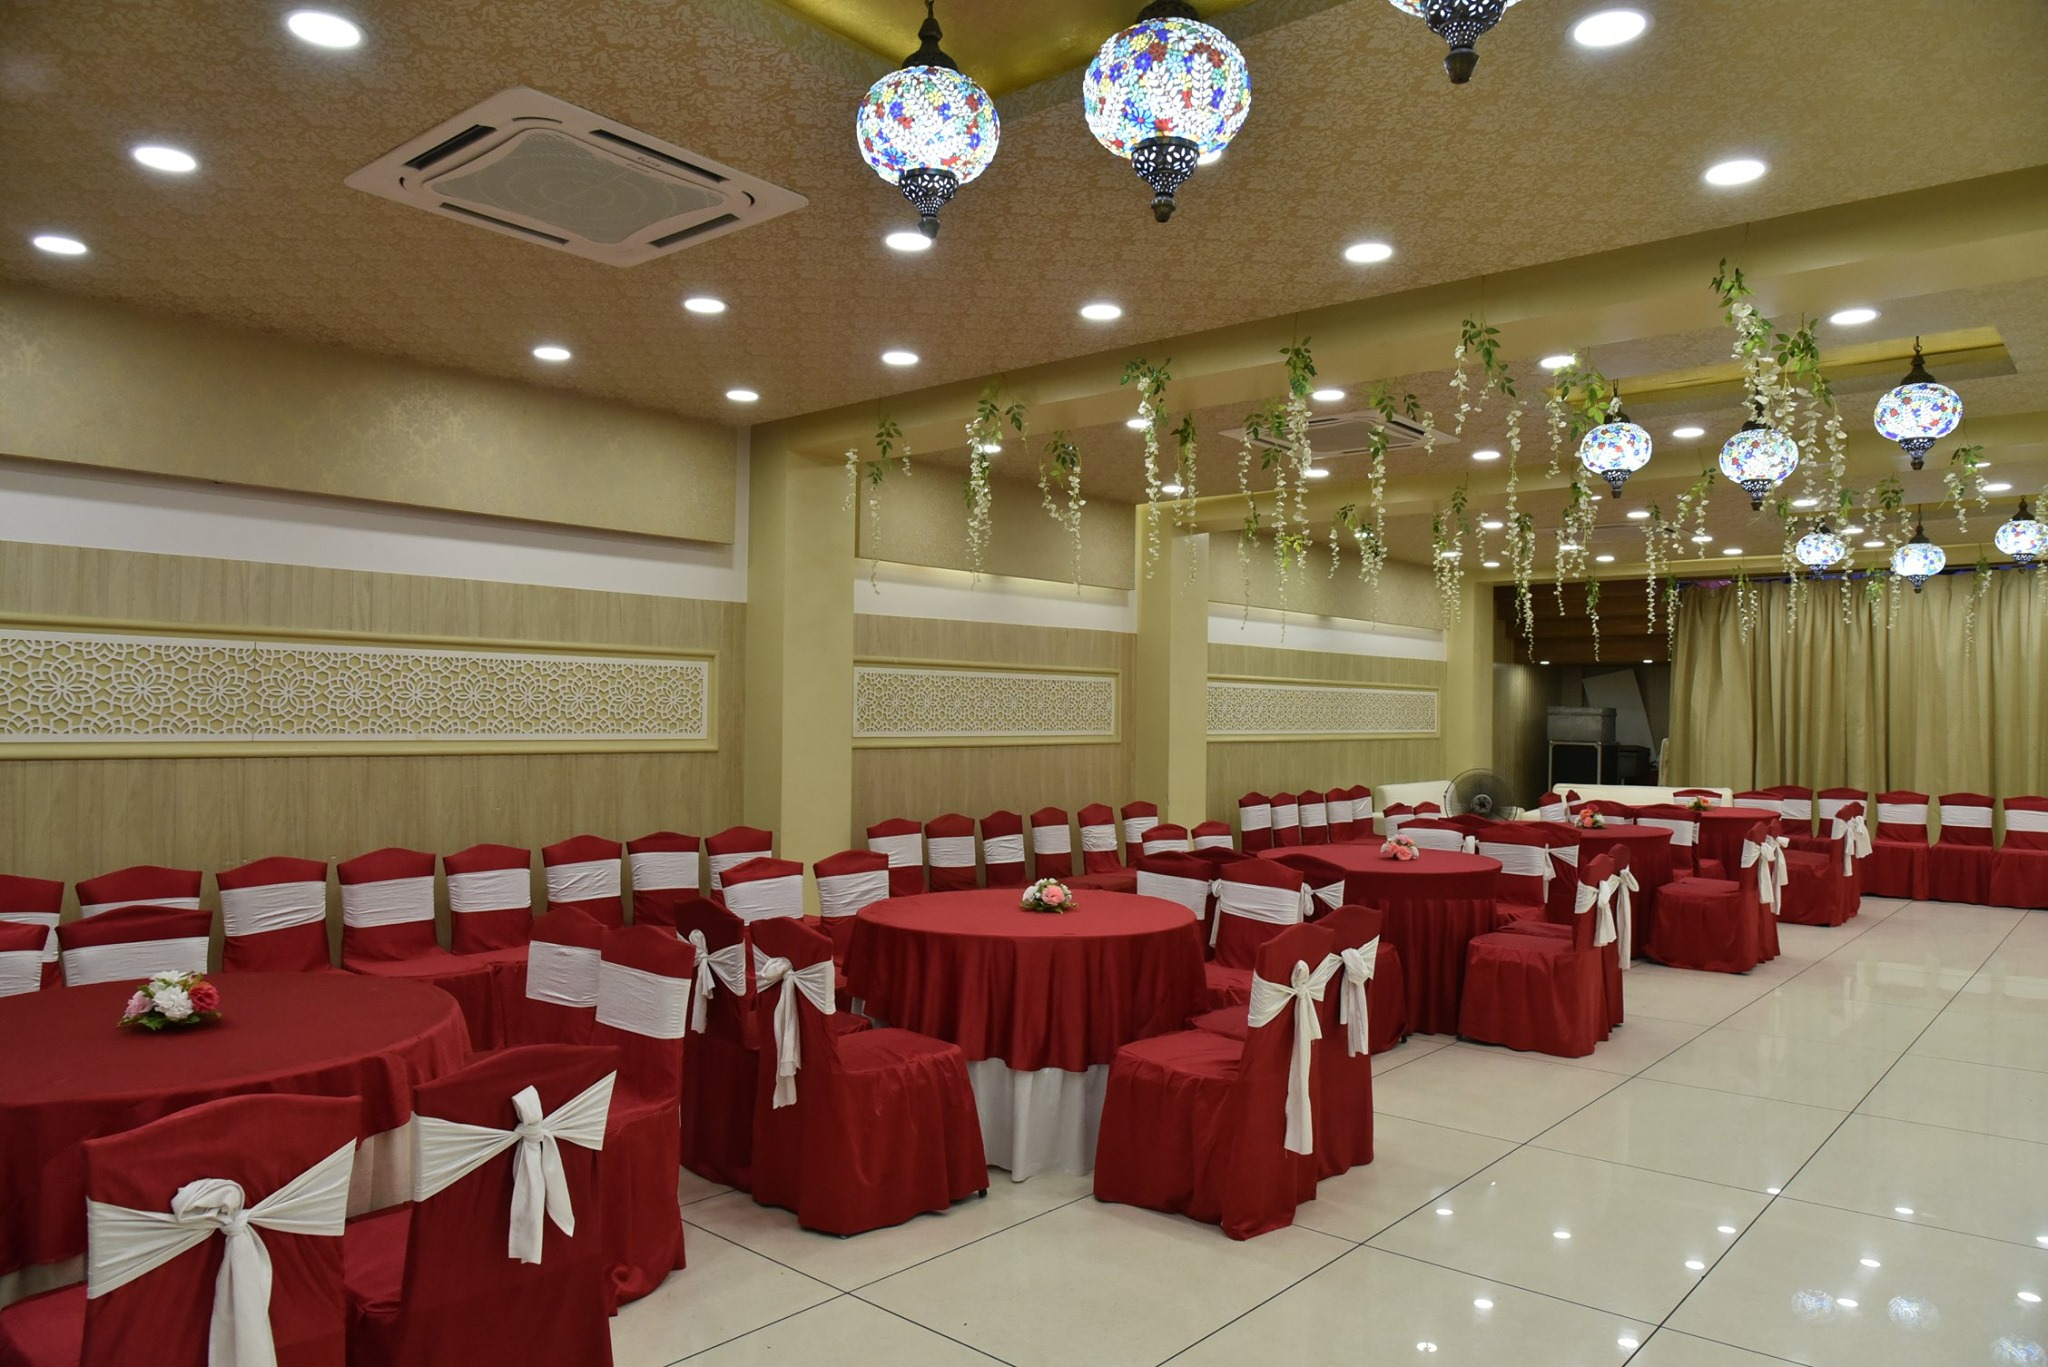 Ratna International Budget Hotel in Lucknow